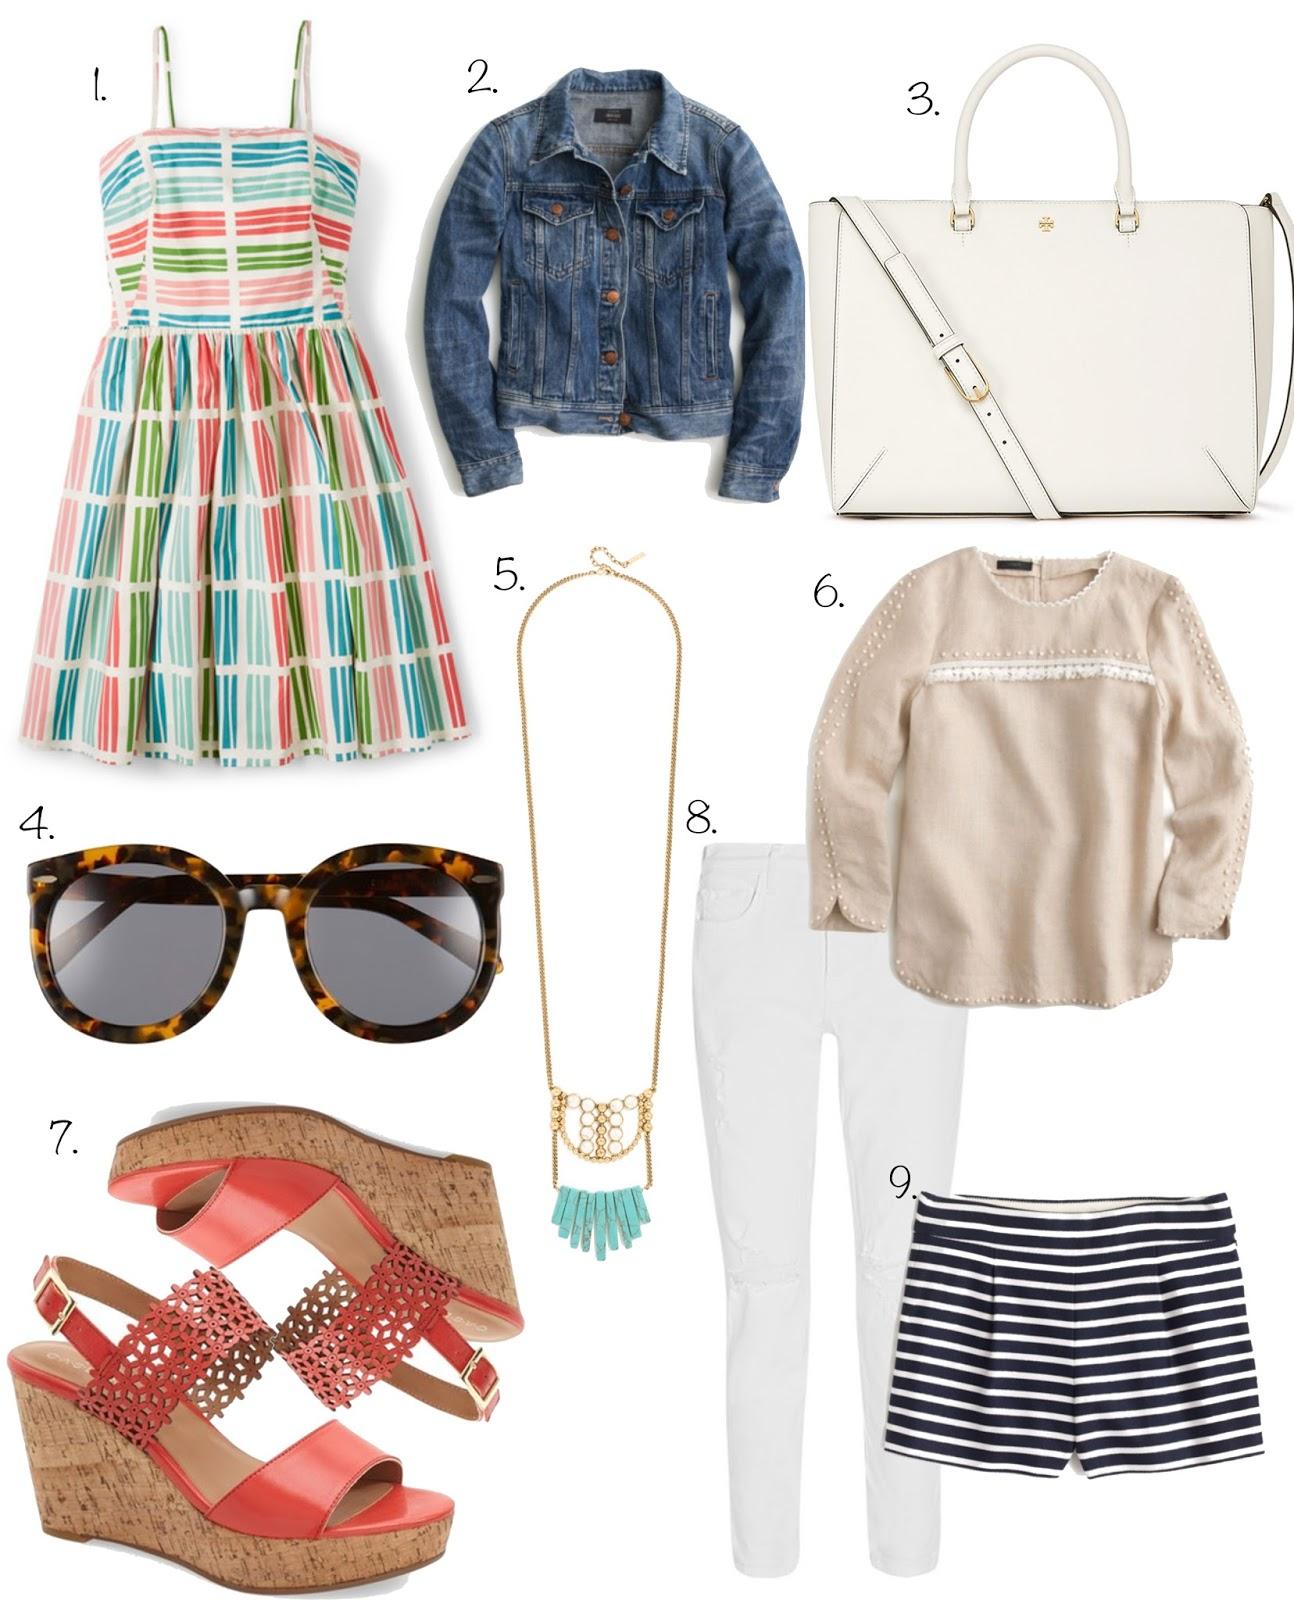 762d3f7e1b9d Fashion Friday  WARDROBE ESSENTIALS FOR SPRING   SUMMER - The ...